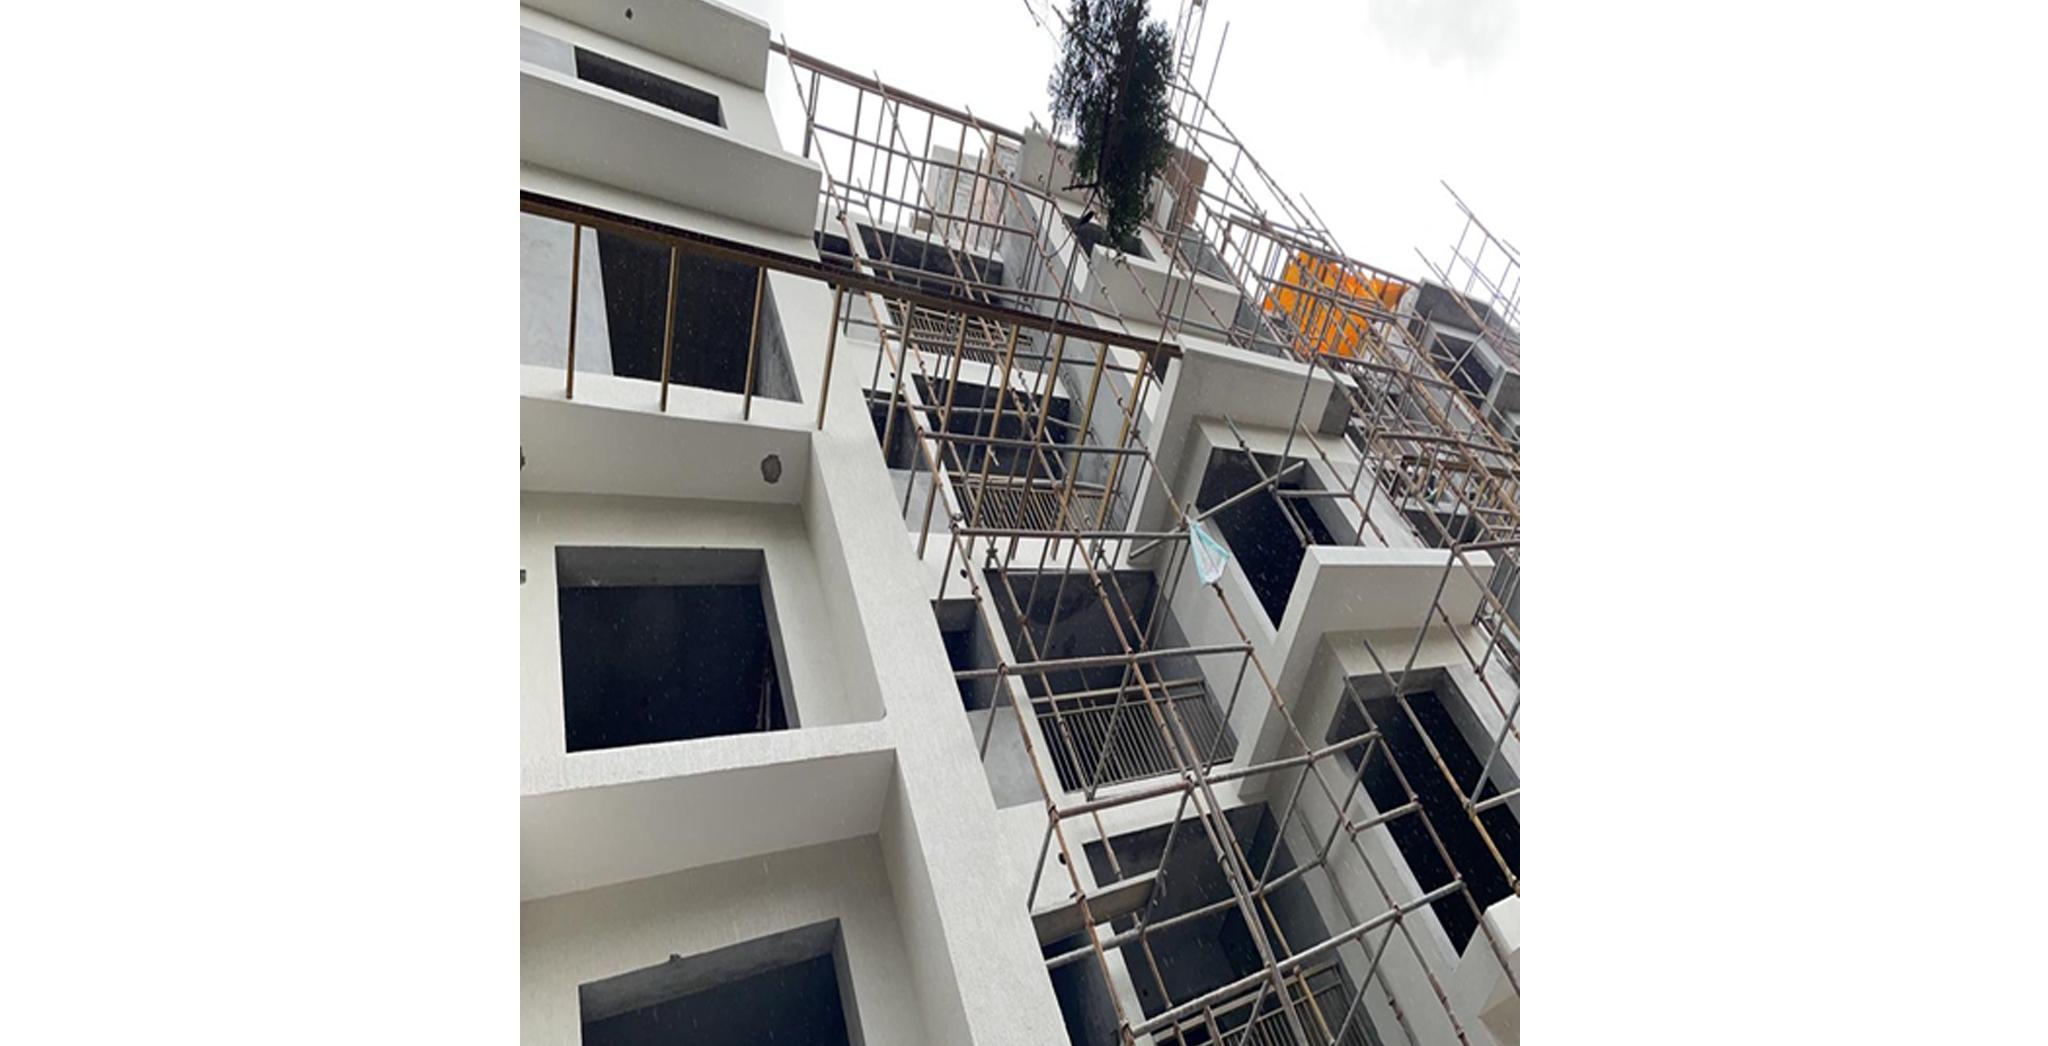 Aug 2021 - C Block: North Elevation External Painting in progress